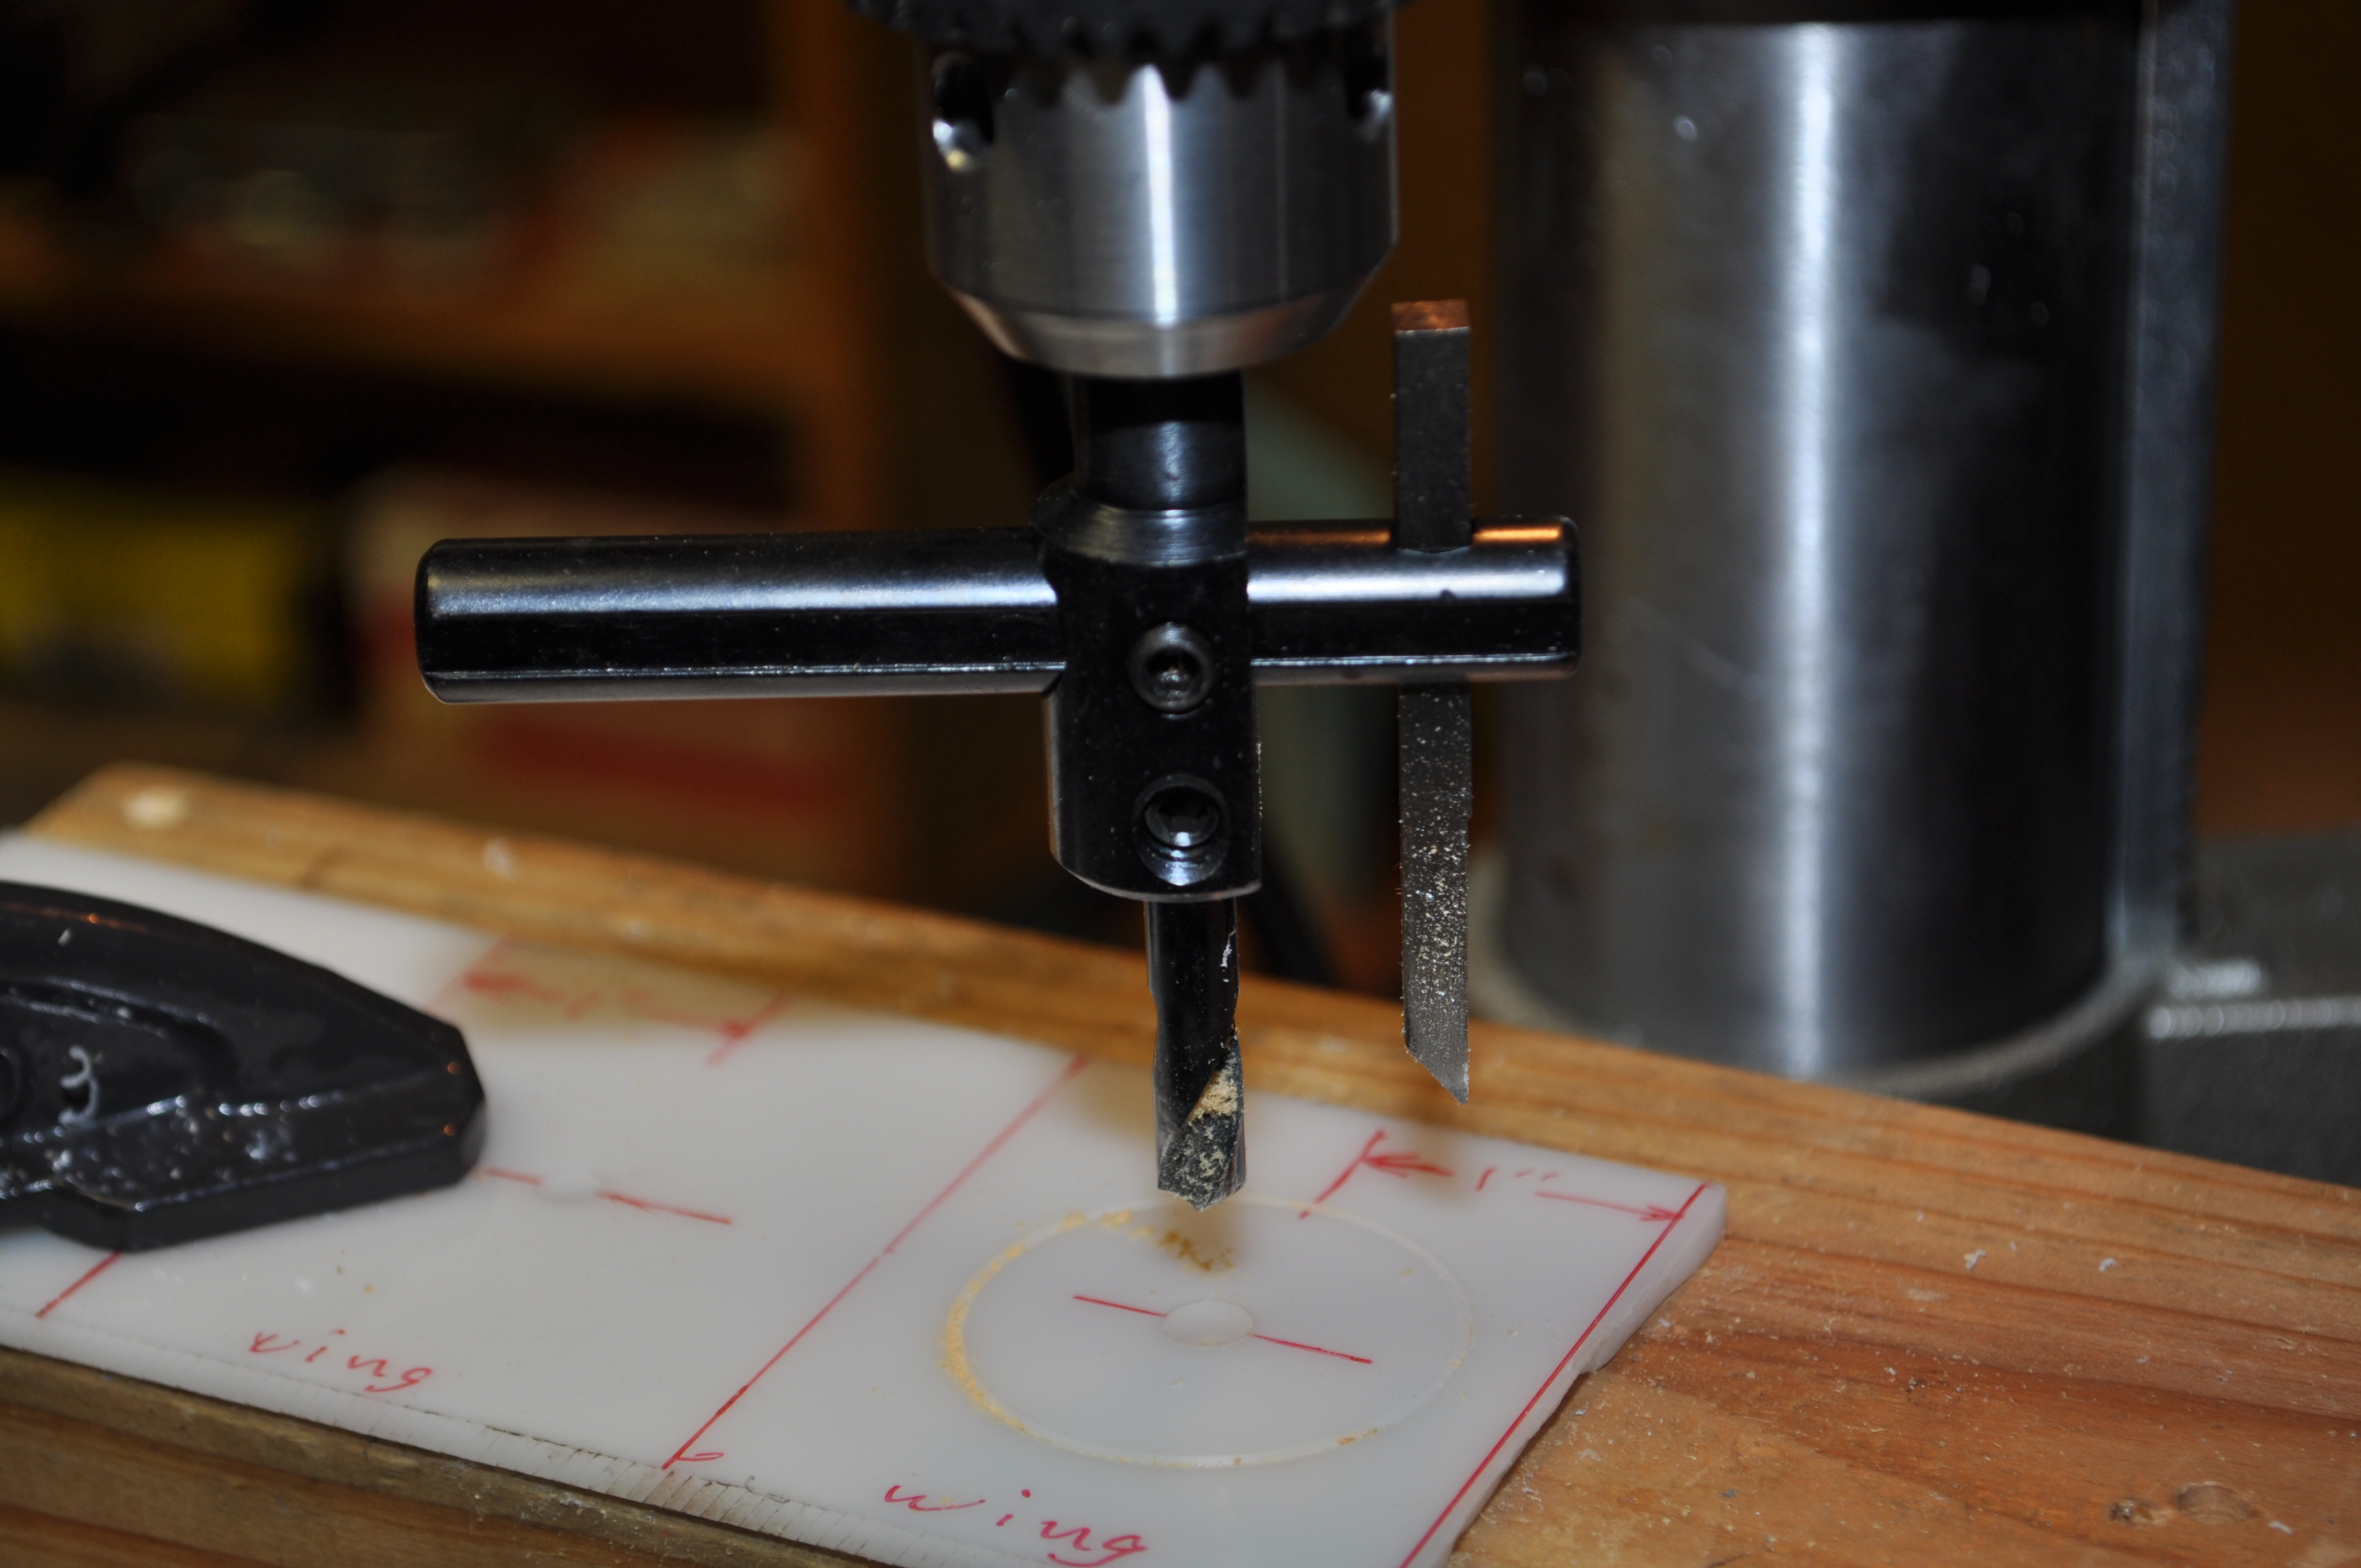 Circular hole cutter